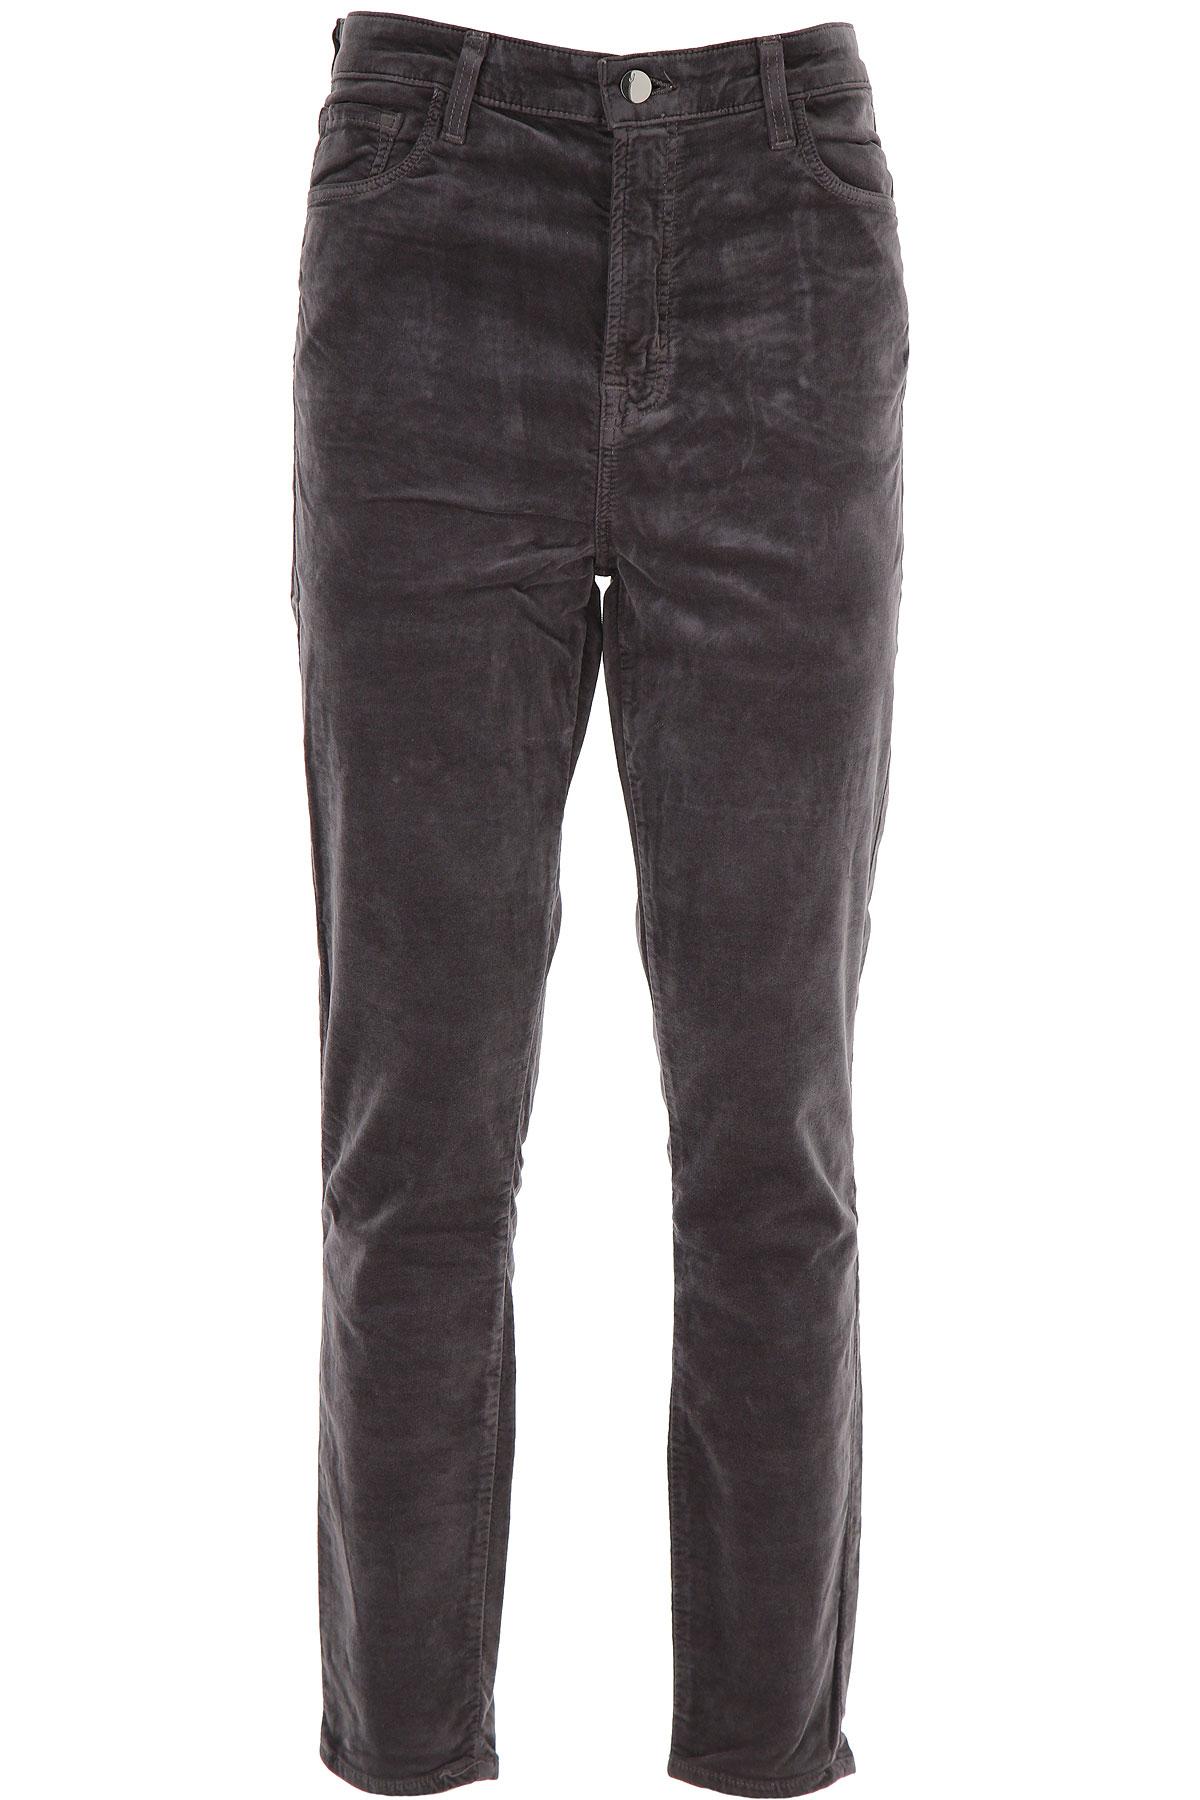 J Brand Pants for Women On Sale, Dark Anthracite Grey, Cotton, 2019, 25 27 30 32